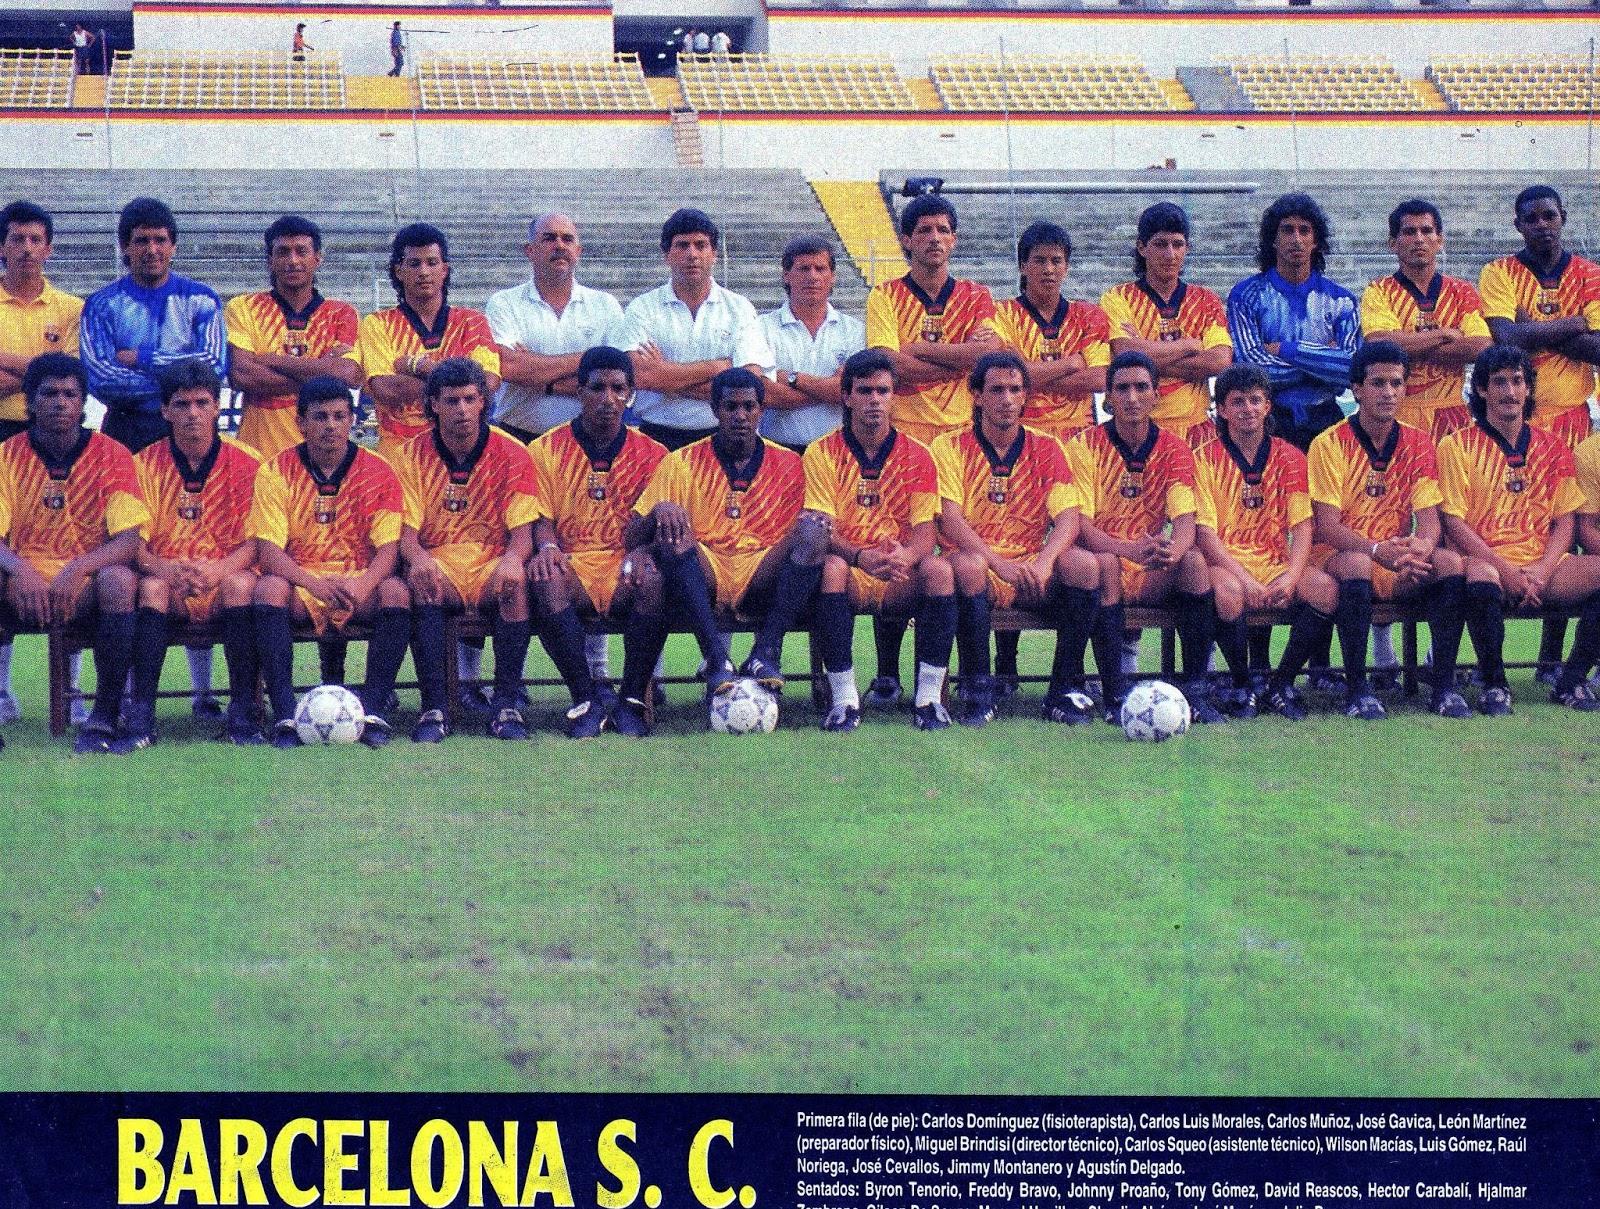 foto club nacional futbol campeon america mundo 1988: